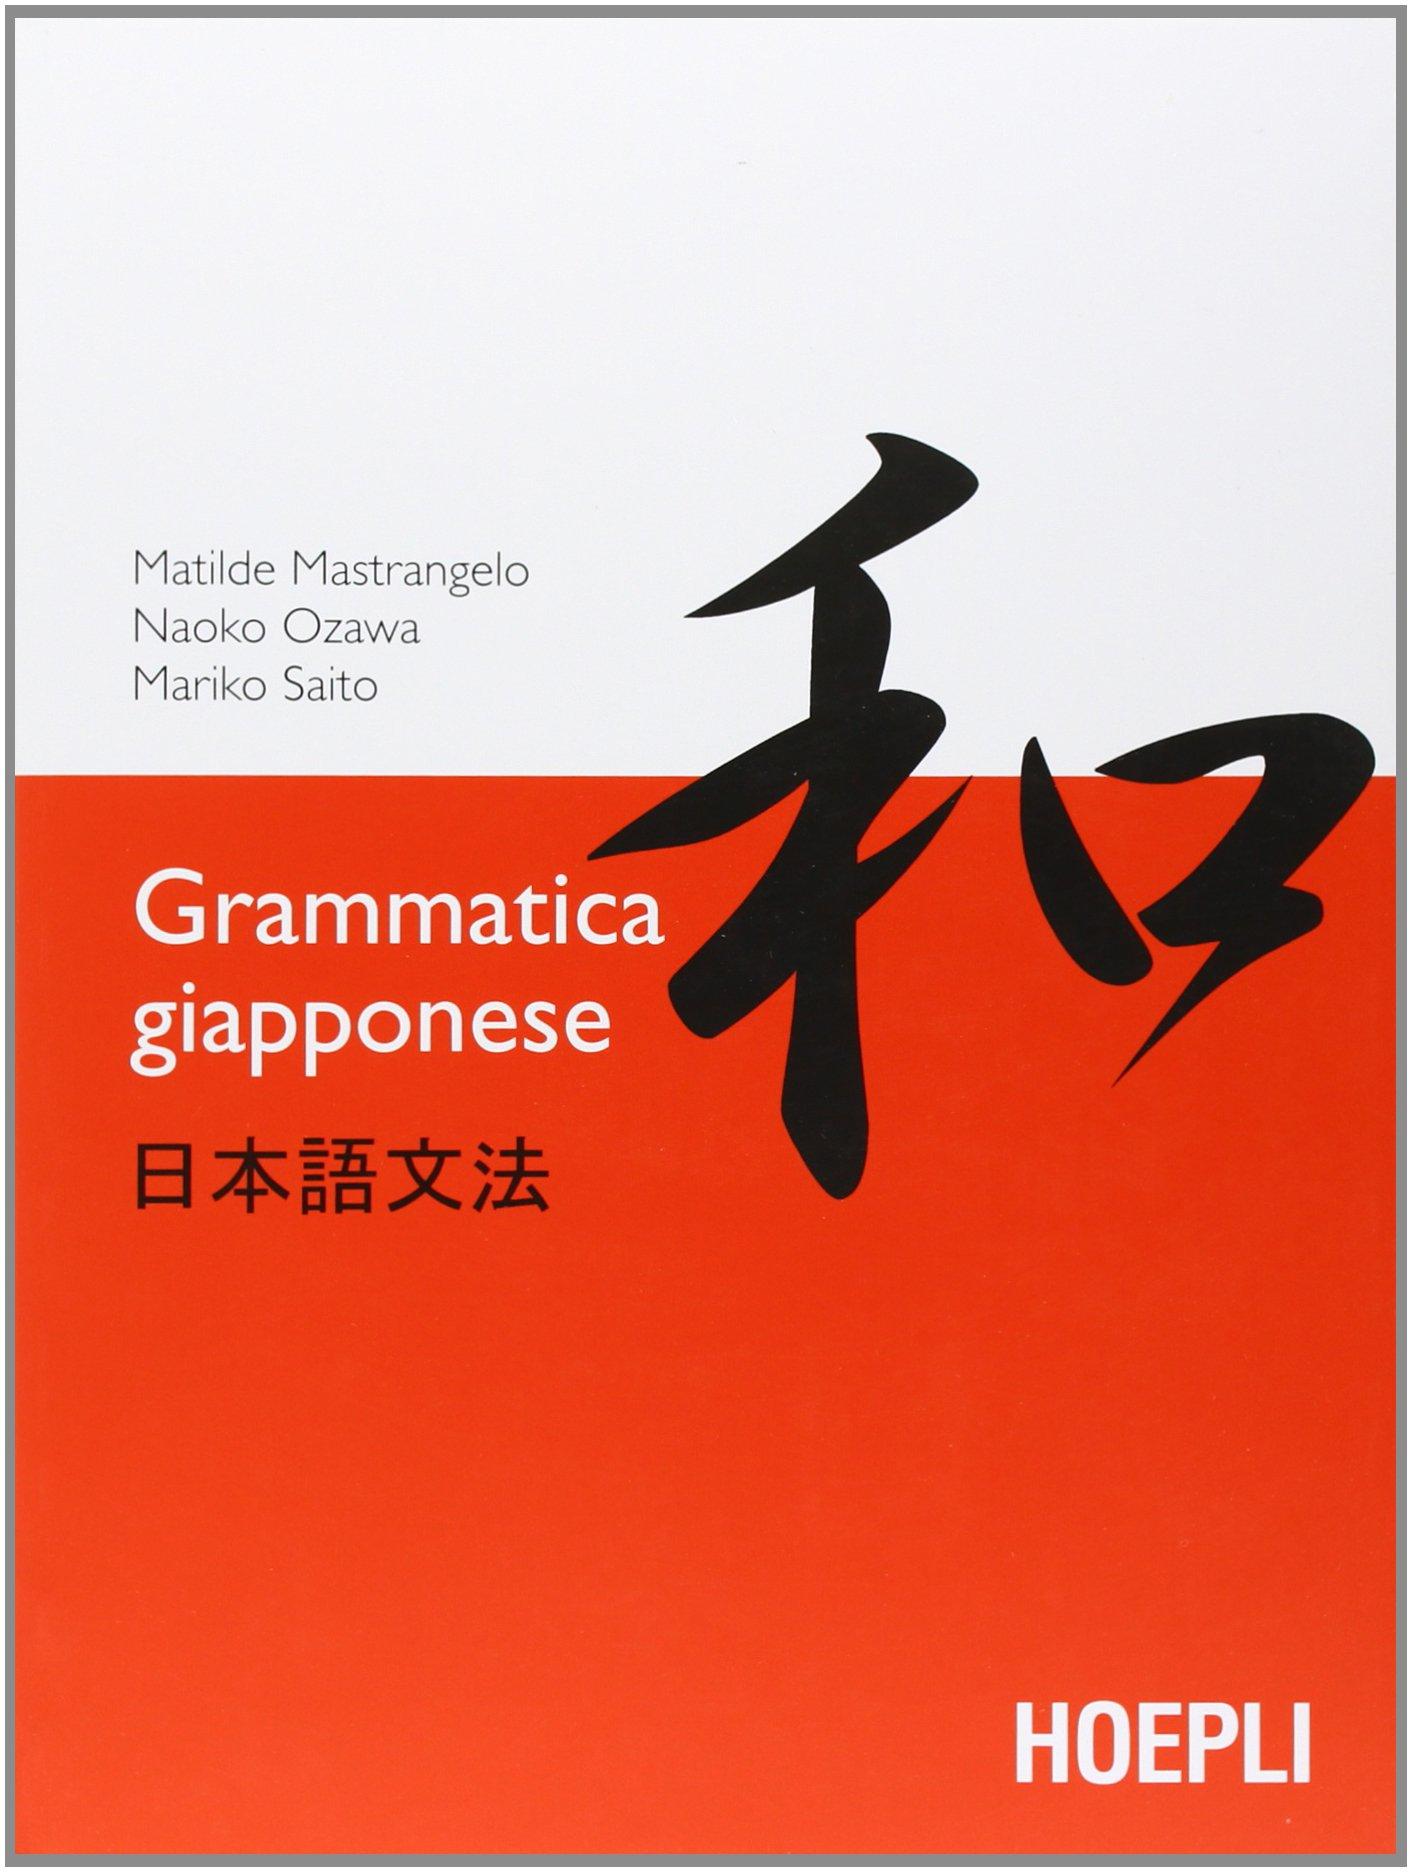 Grammatica Giapponese Hoepli Pdf